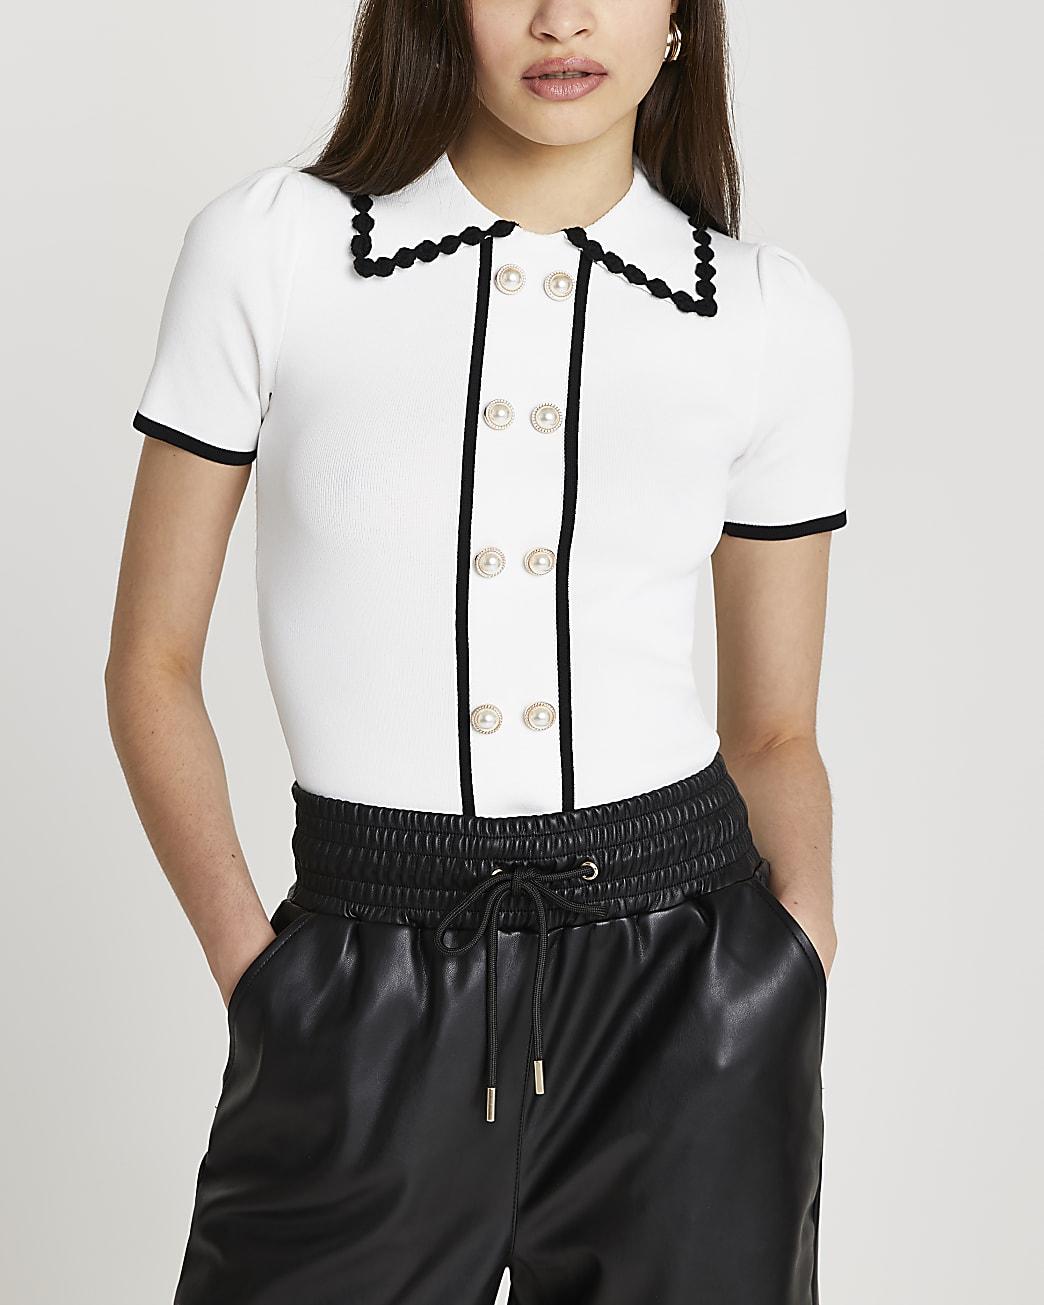 White collar short sleeve top